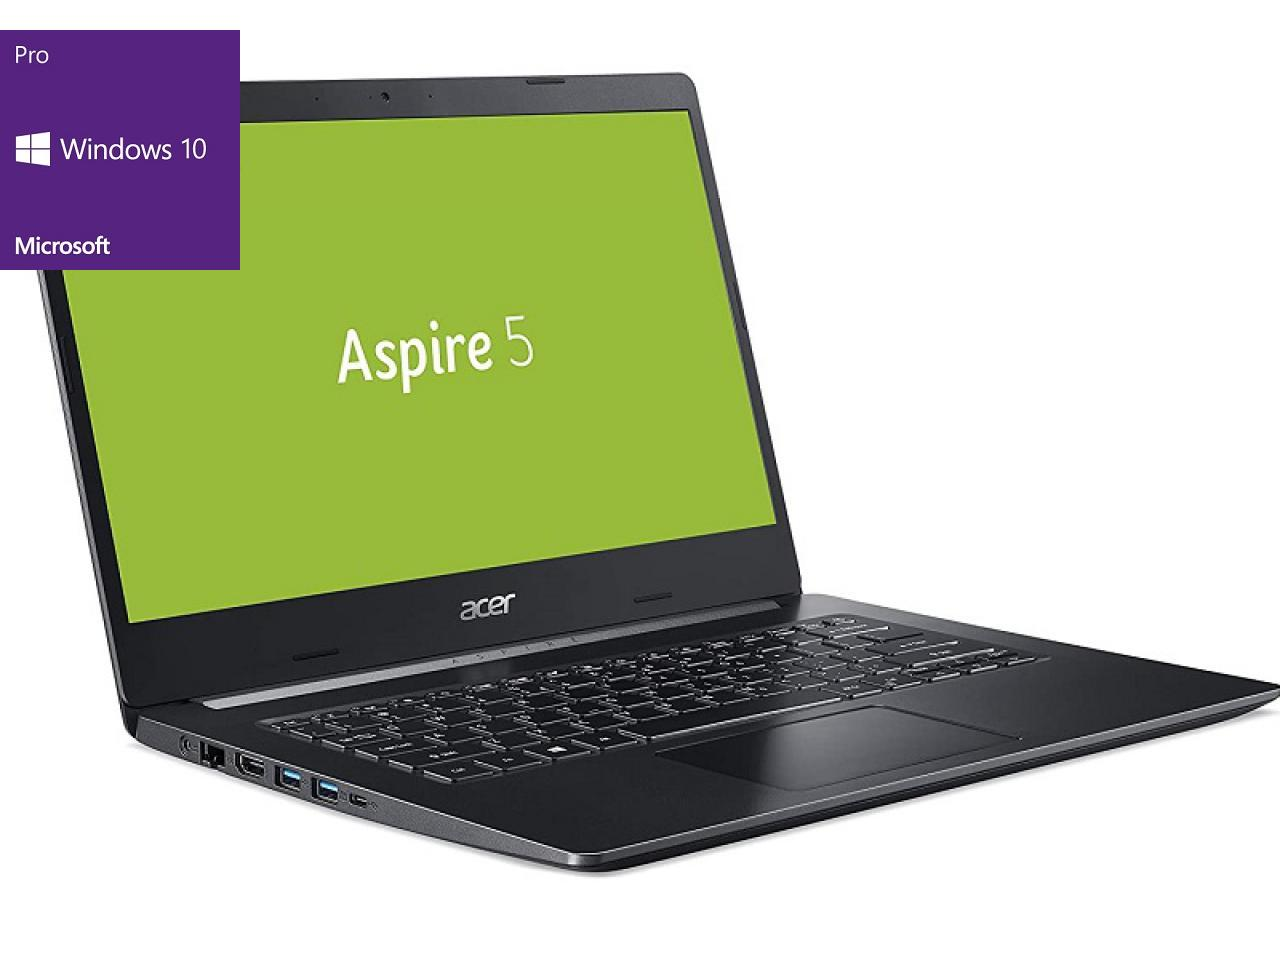 Acer Aspire 5 A514-52-35JS